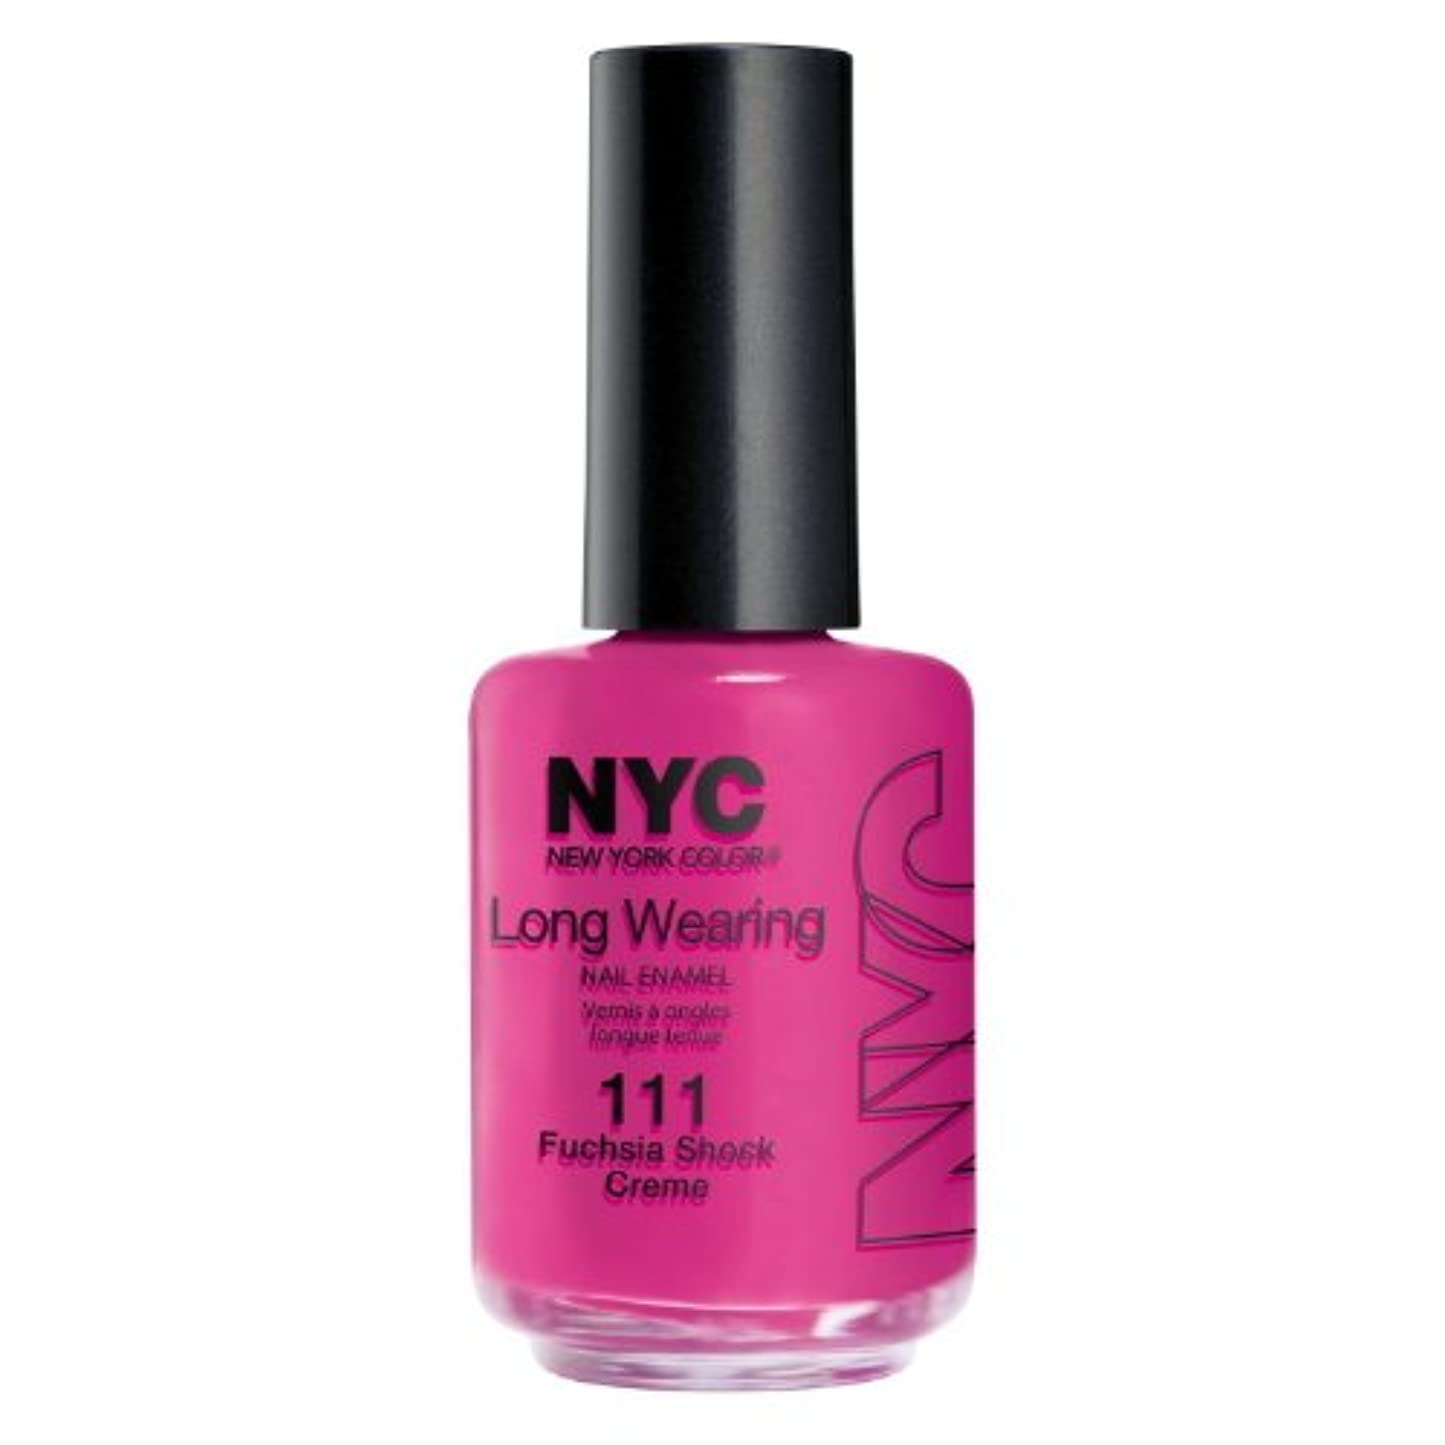 絶滅海岸配管工(6 Pack) NYC Long Wearing Nail Enamel - Fuchisia Shock Creme (並行輸入品)